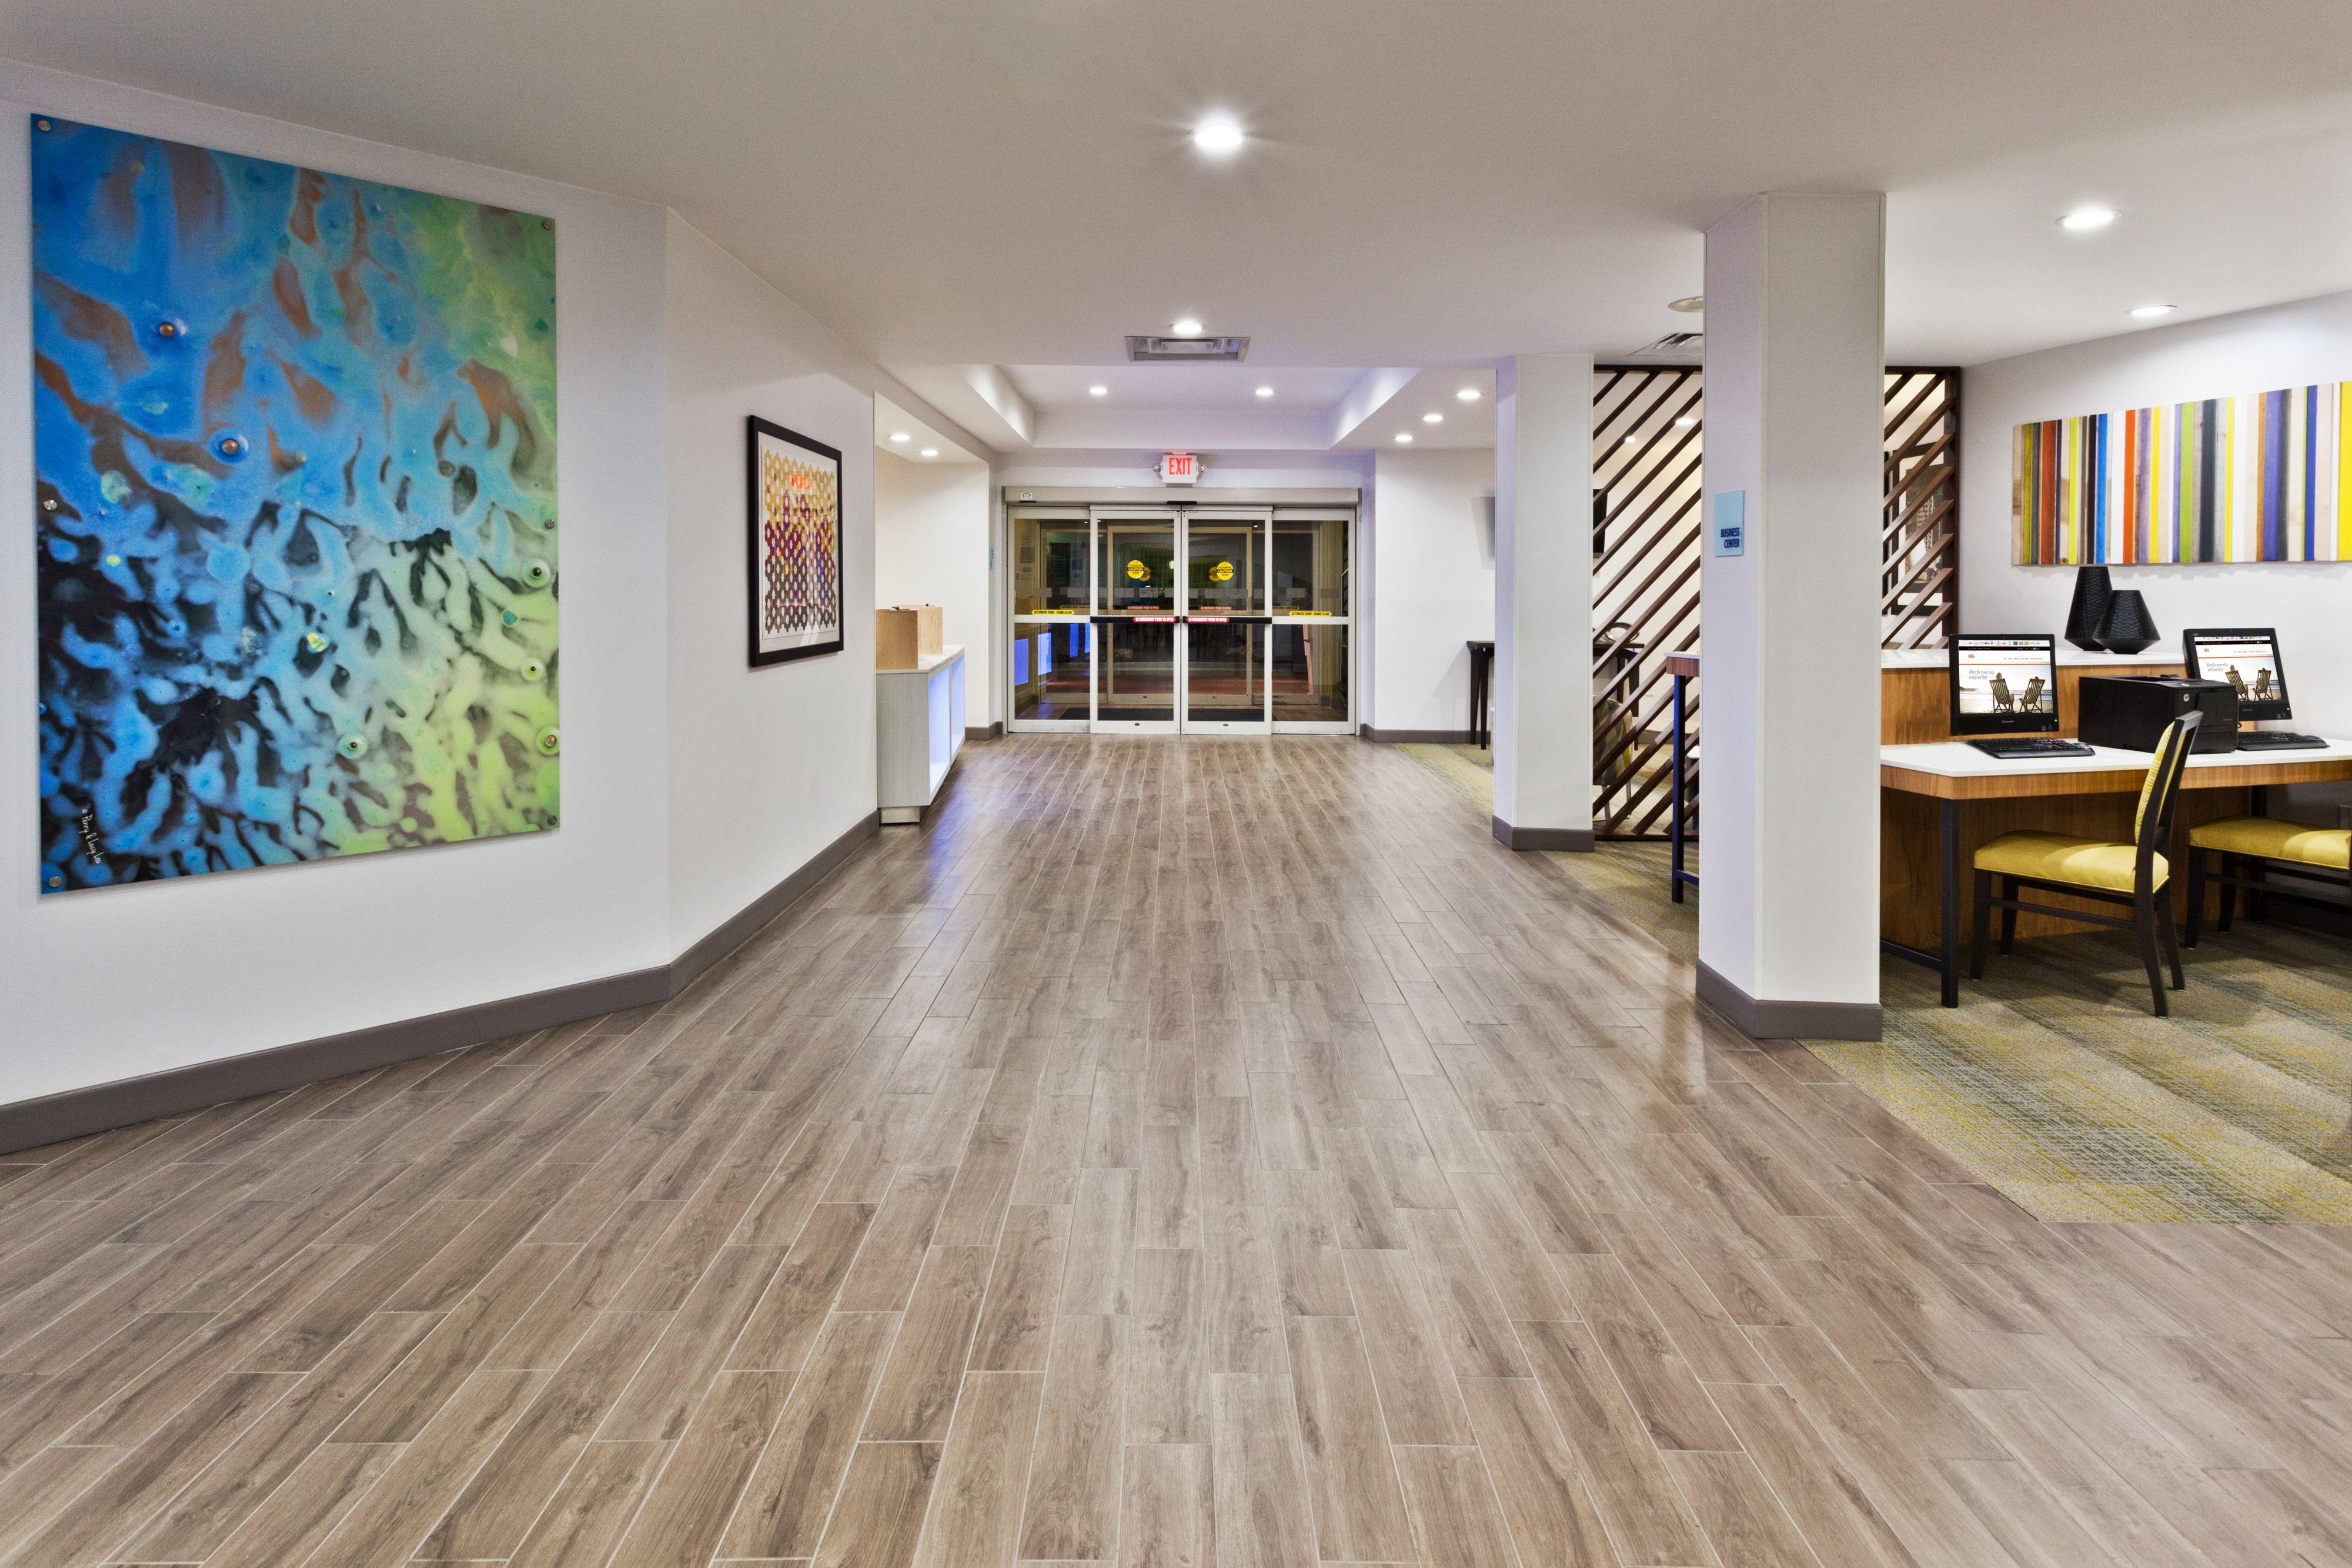 Holiday Inn Express Phenix City-Ft.Benning Area image 5